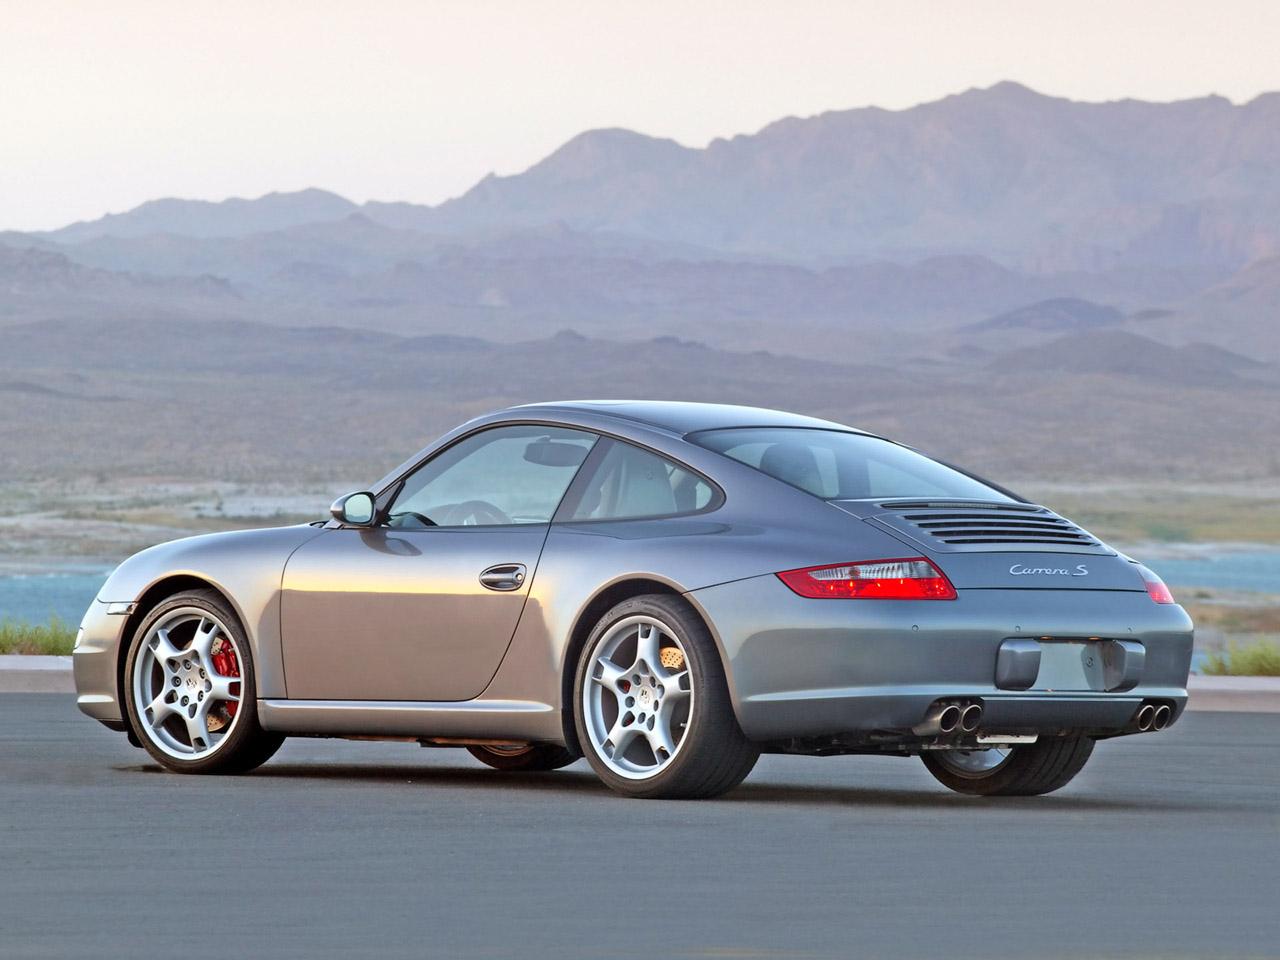 Porsche 997.1 911 Carrera S